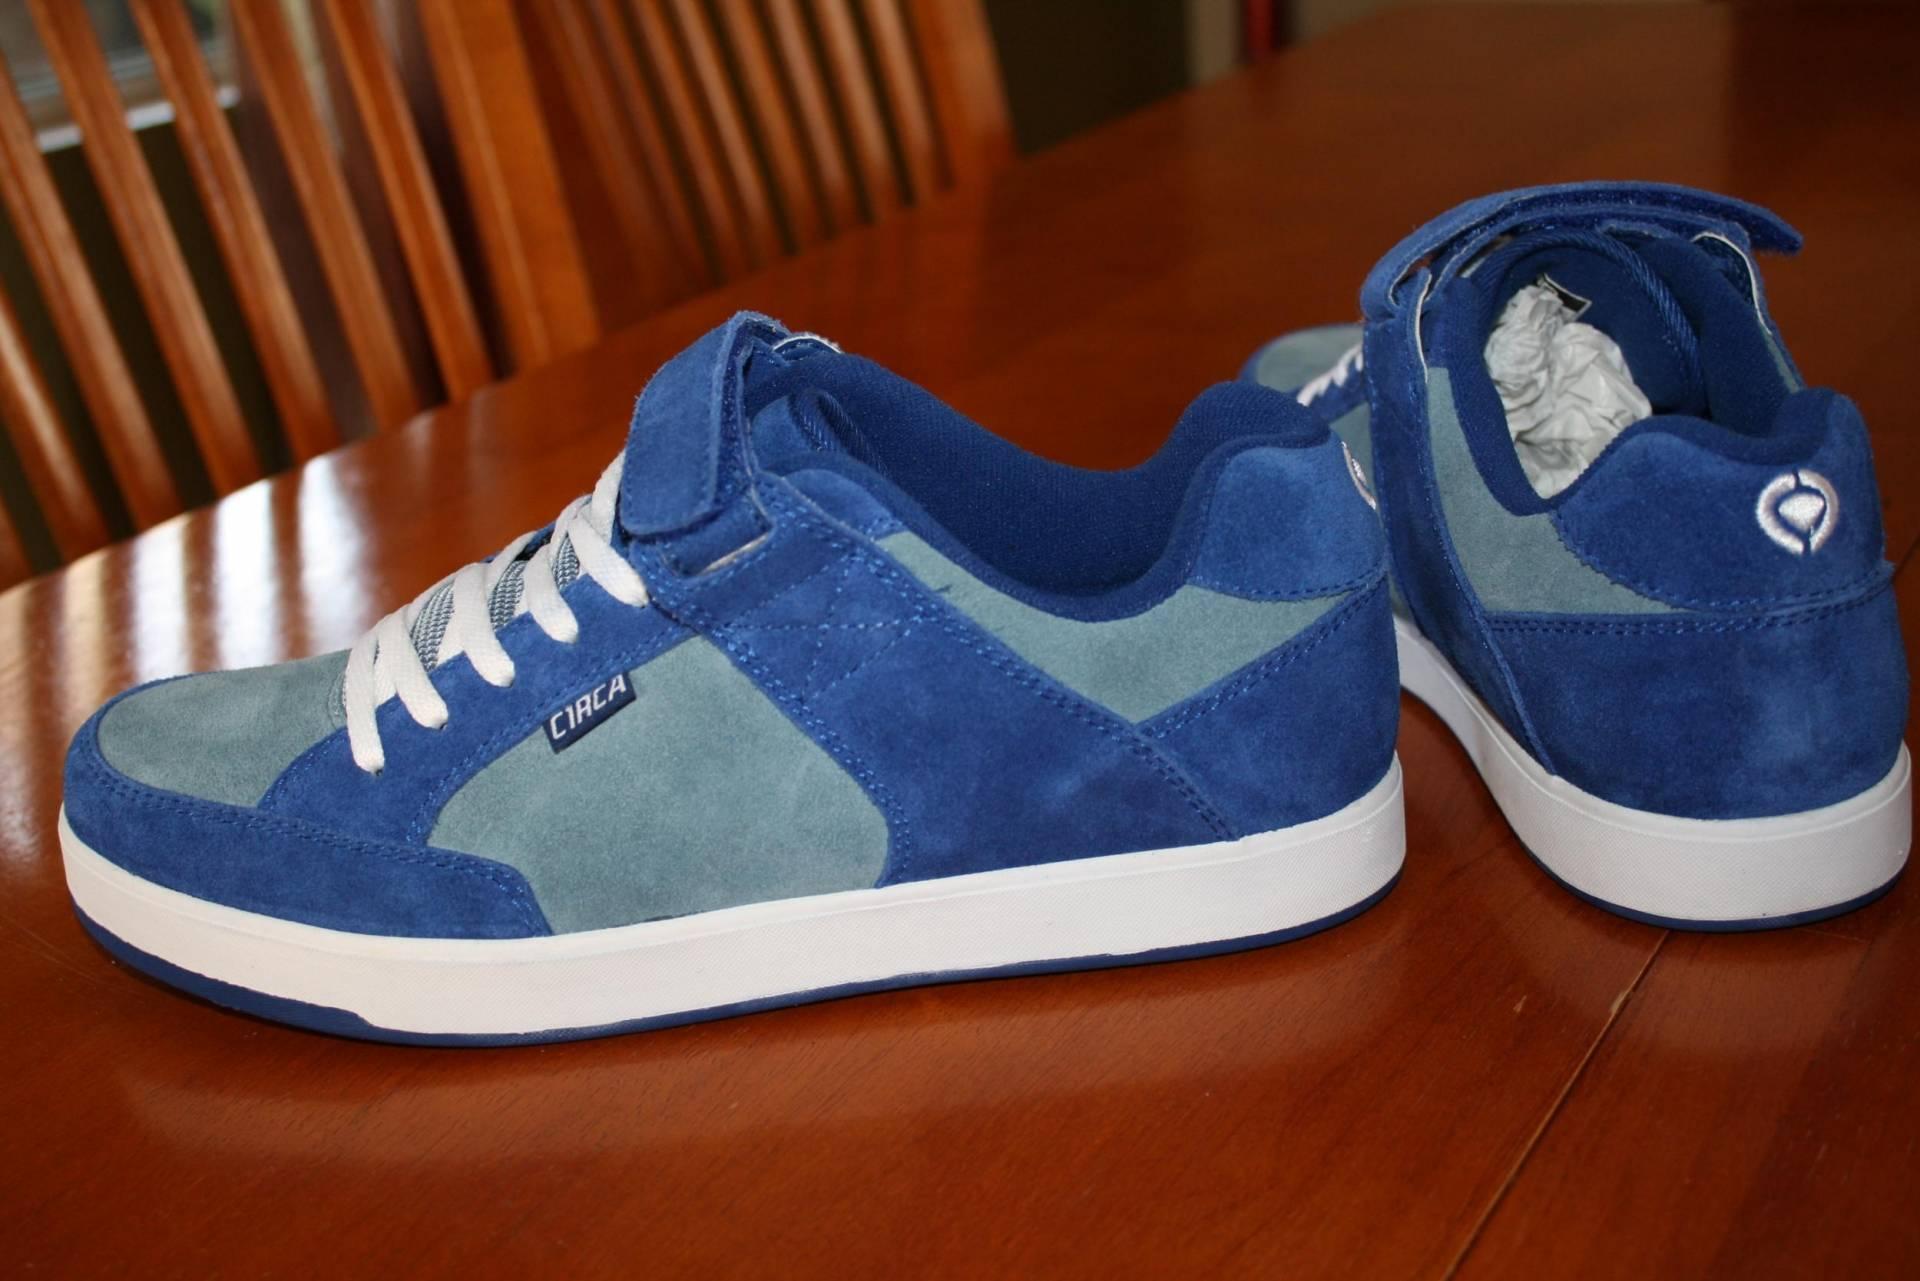 Skate shoes size 9 - File Size 181 Kb